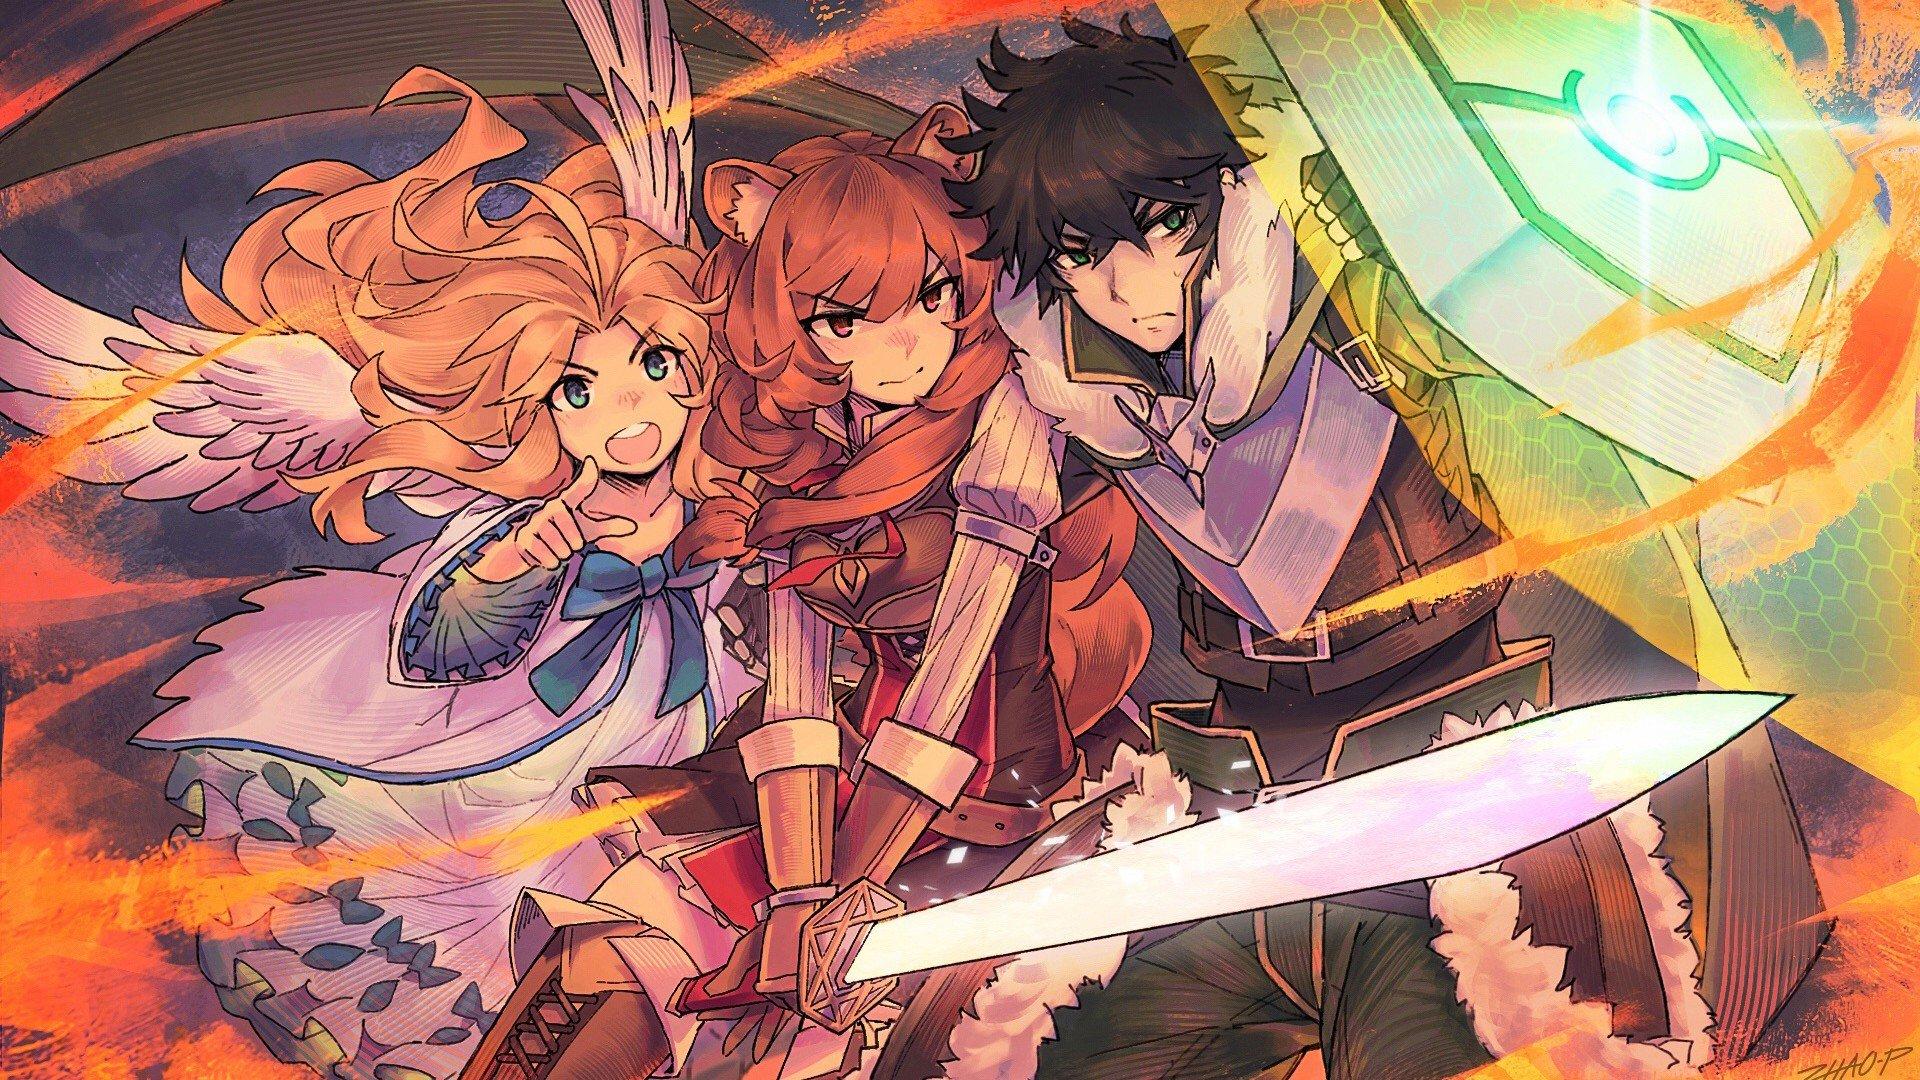 Anime Wallpaper Filo, Naofumi Iwatani from The Rising Of The Shield Hero